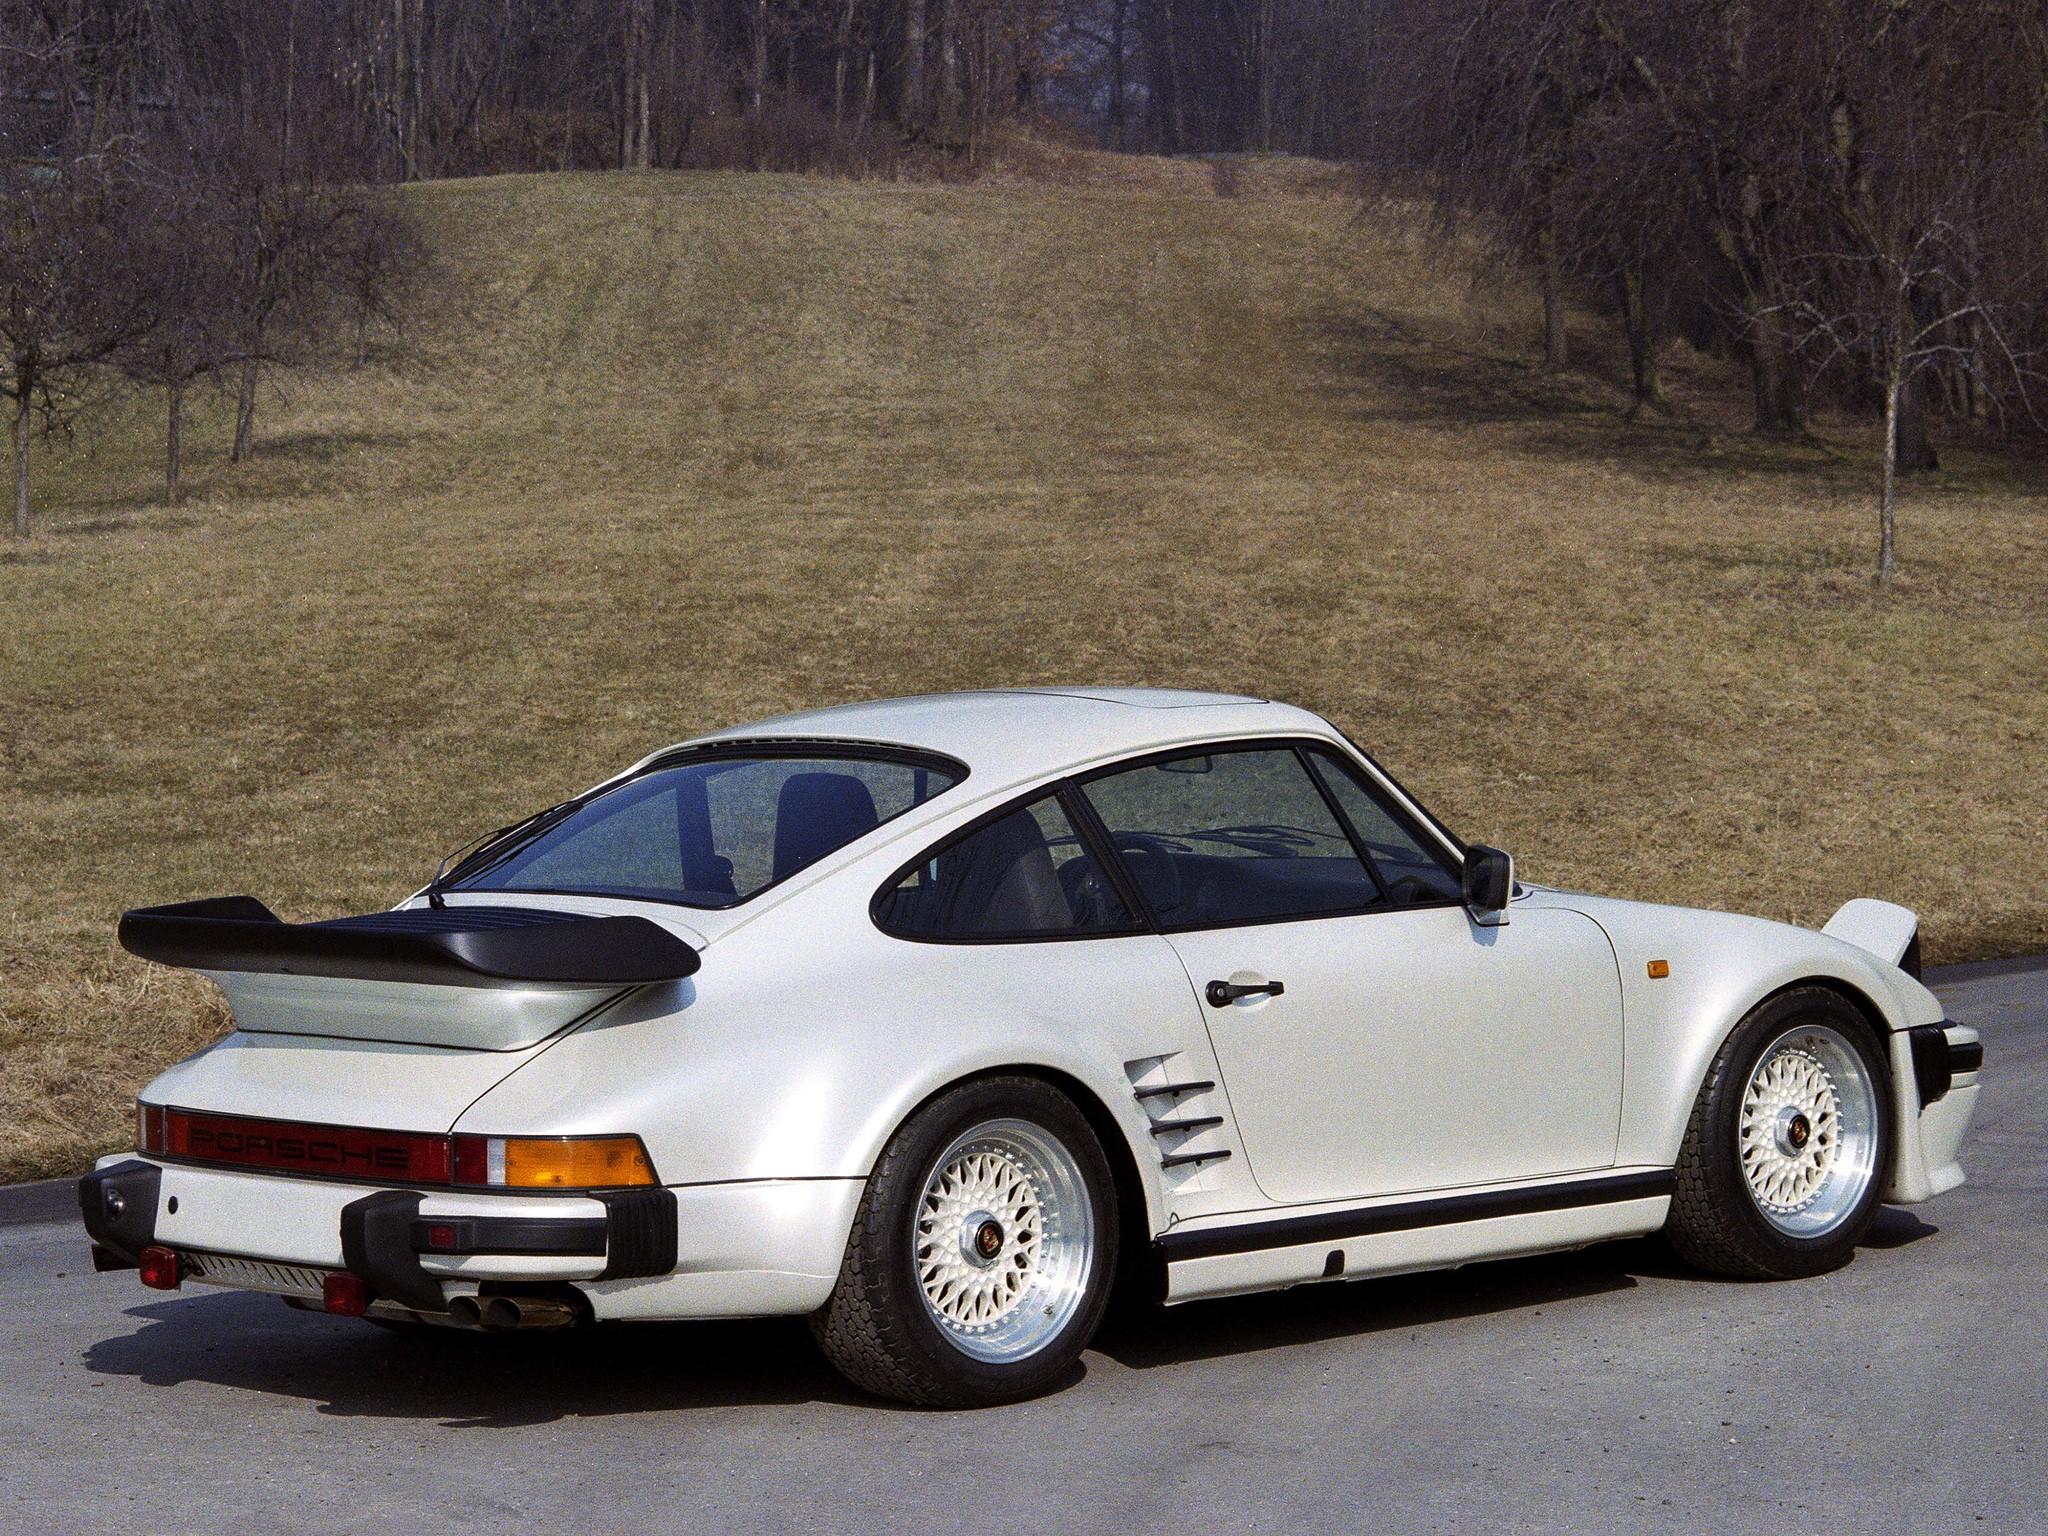 1985 porsche 911 turbo image collections hd cars wallpaper porsche 911 turbo flachbau 930 specs 1981 1982 1983 1984 porsche 911 turbo flachbau 930 1981 vanachro Gallery